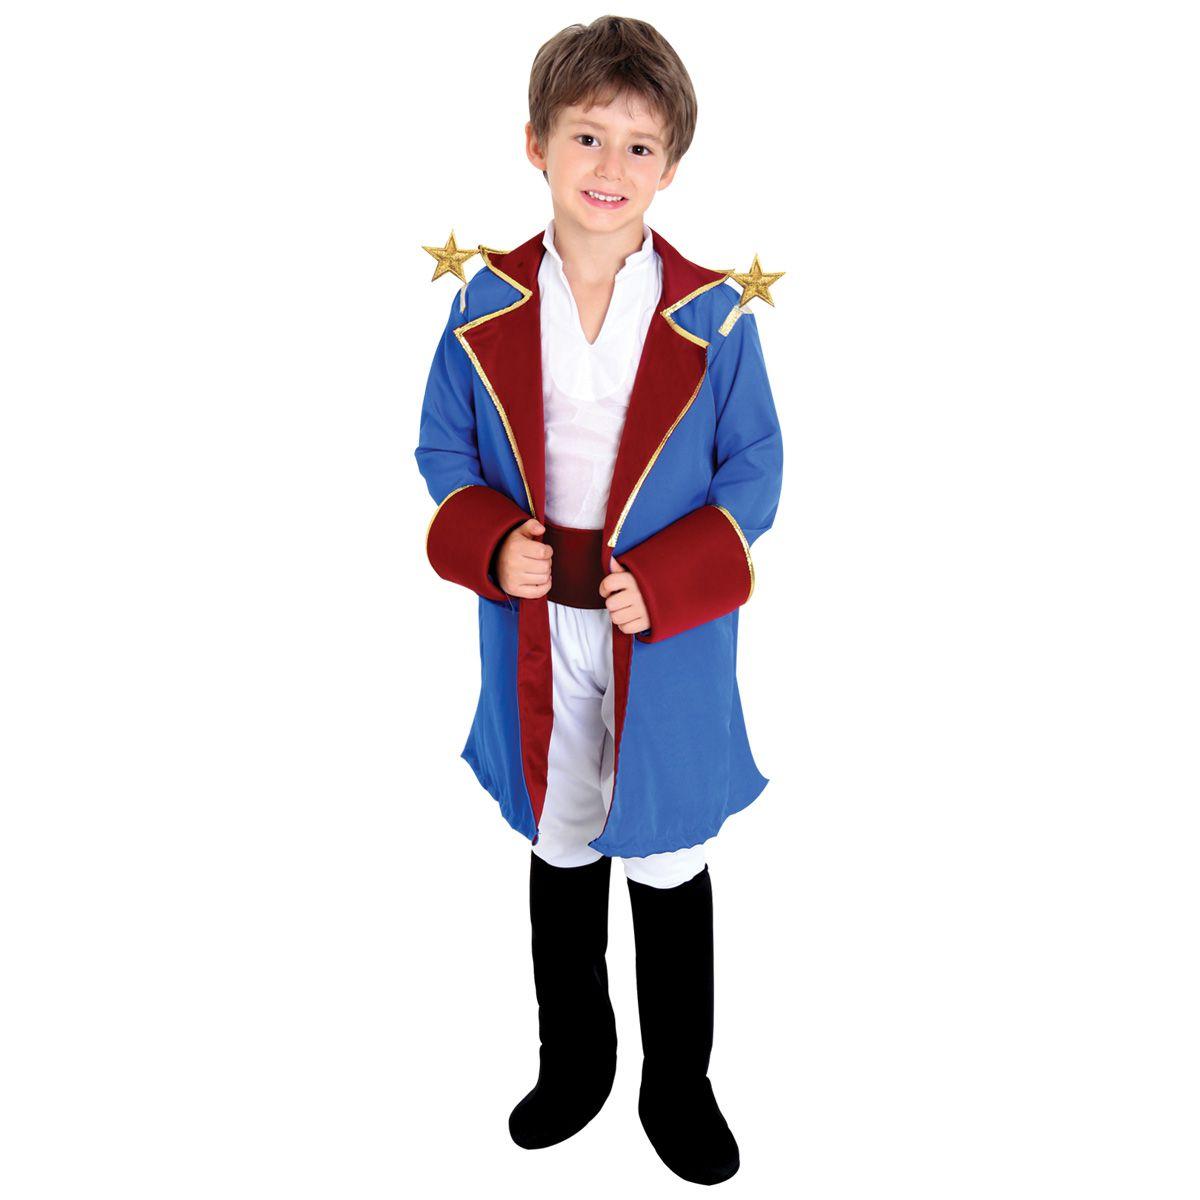 Fantasia Pequeno Príncipe Infantil Luxo